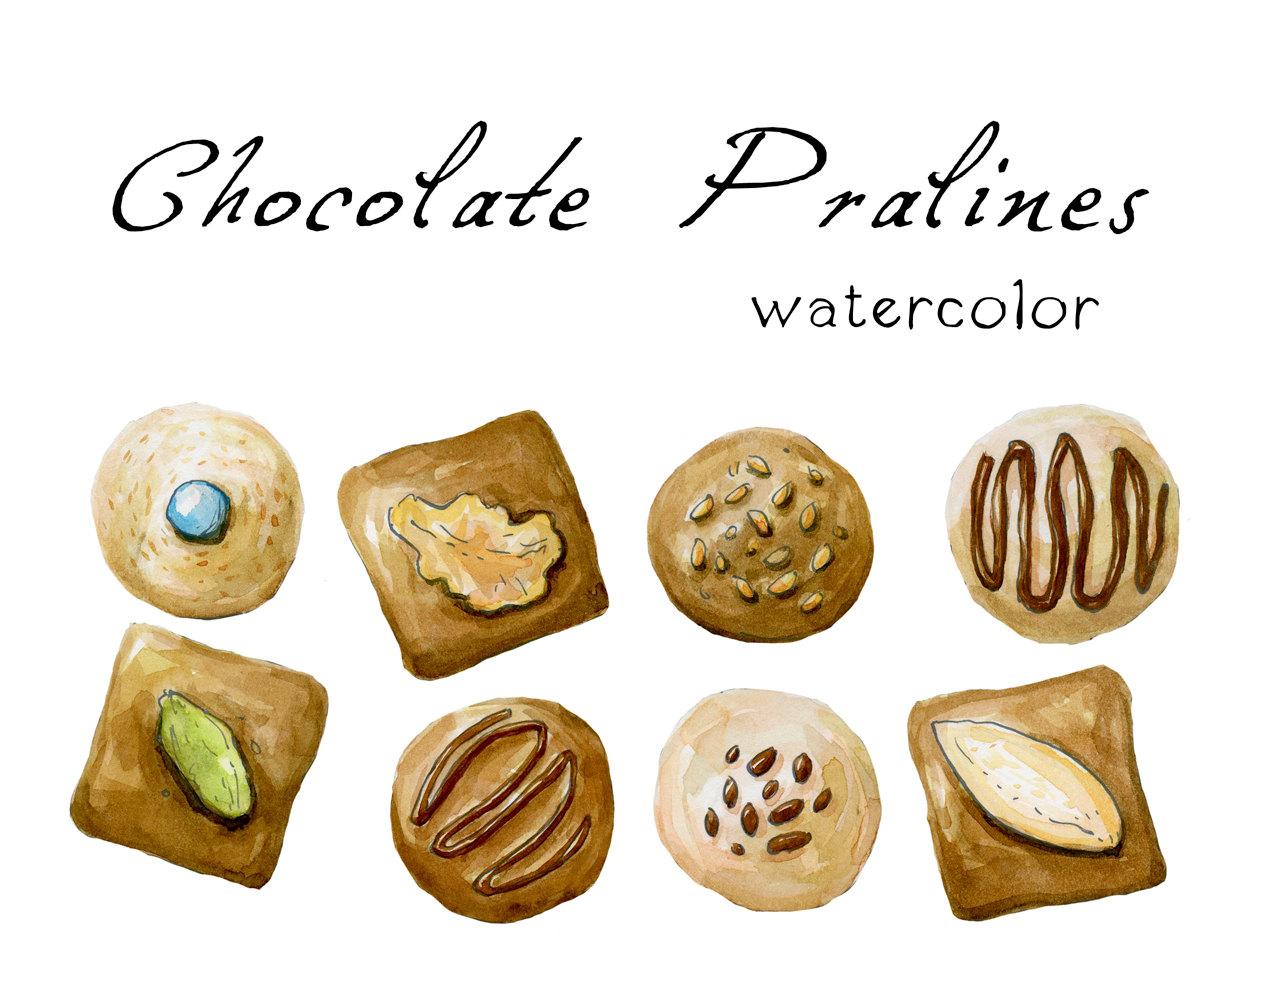 Chocolate pralines.